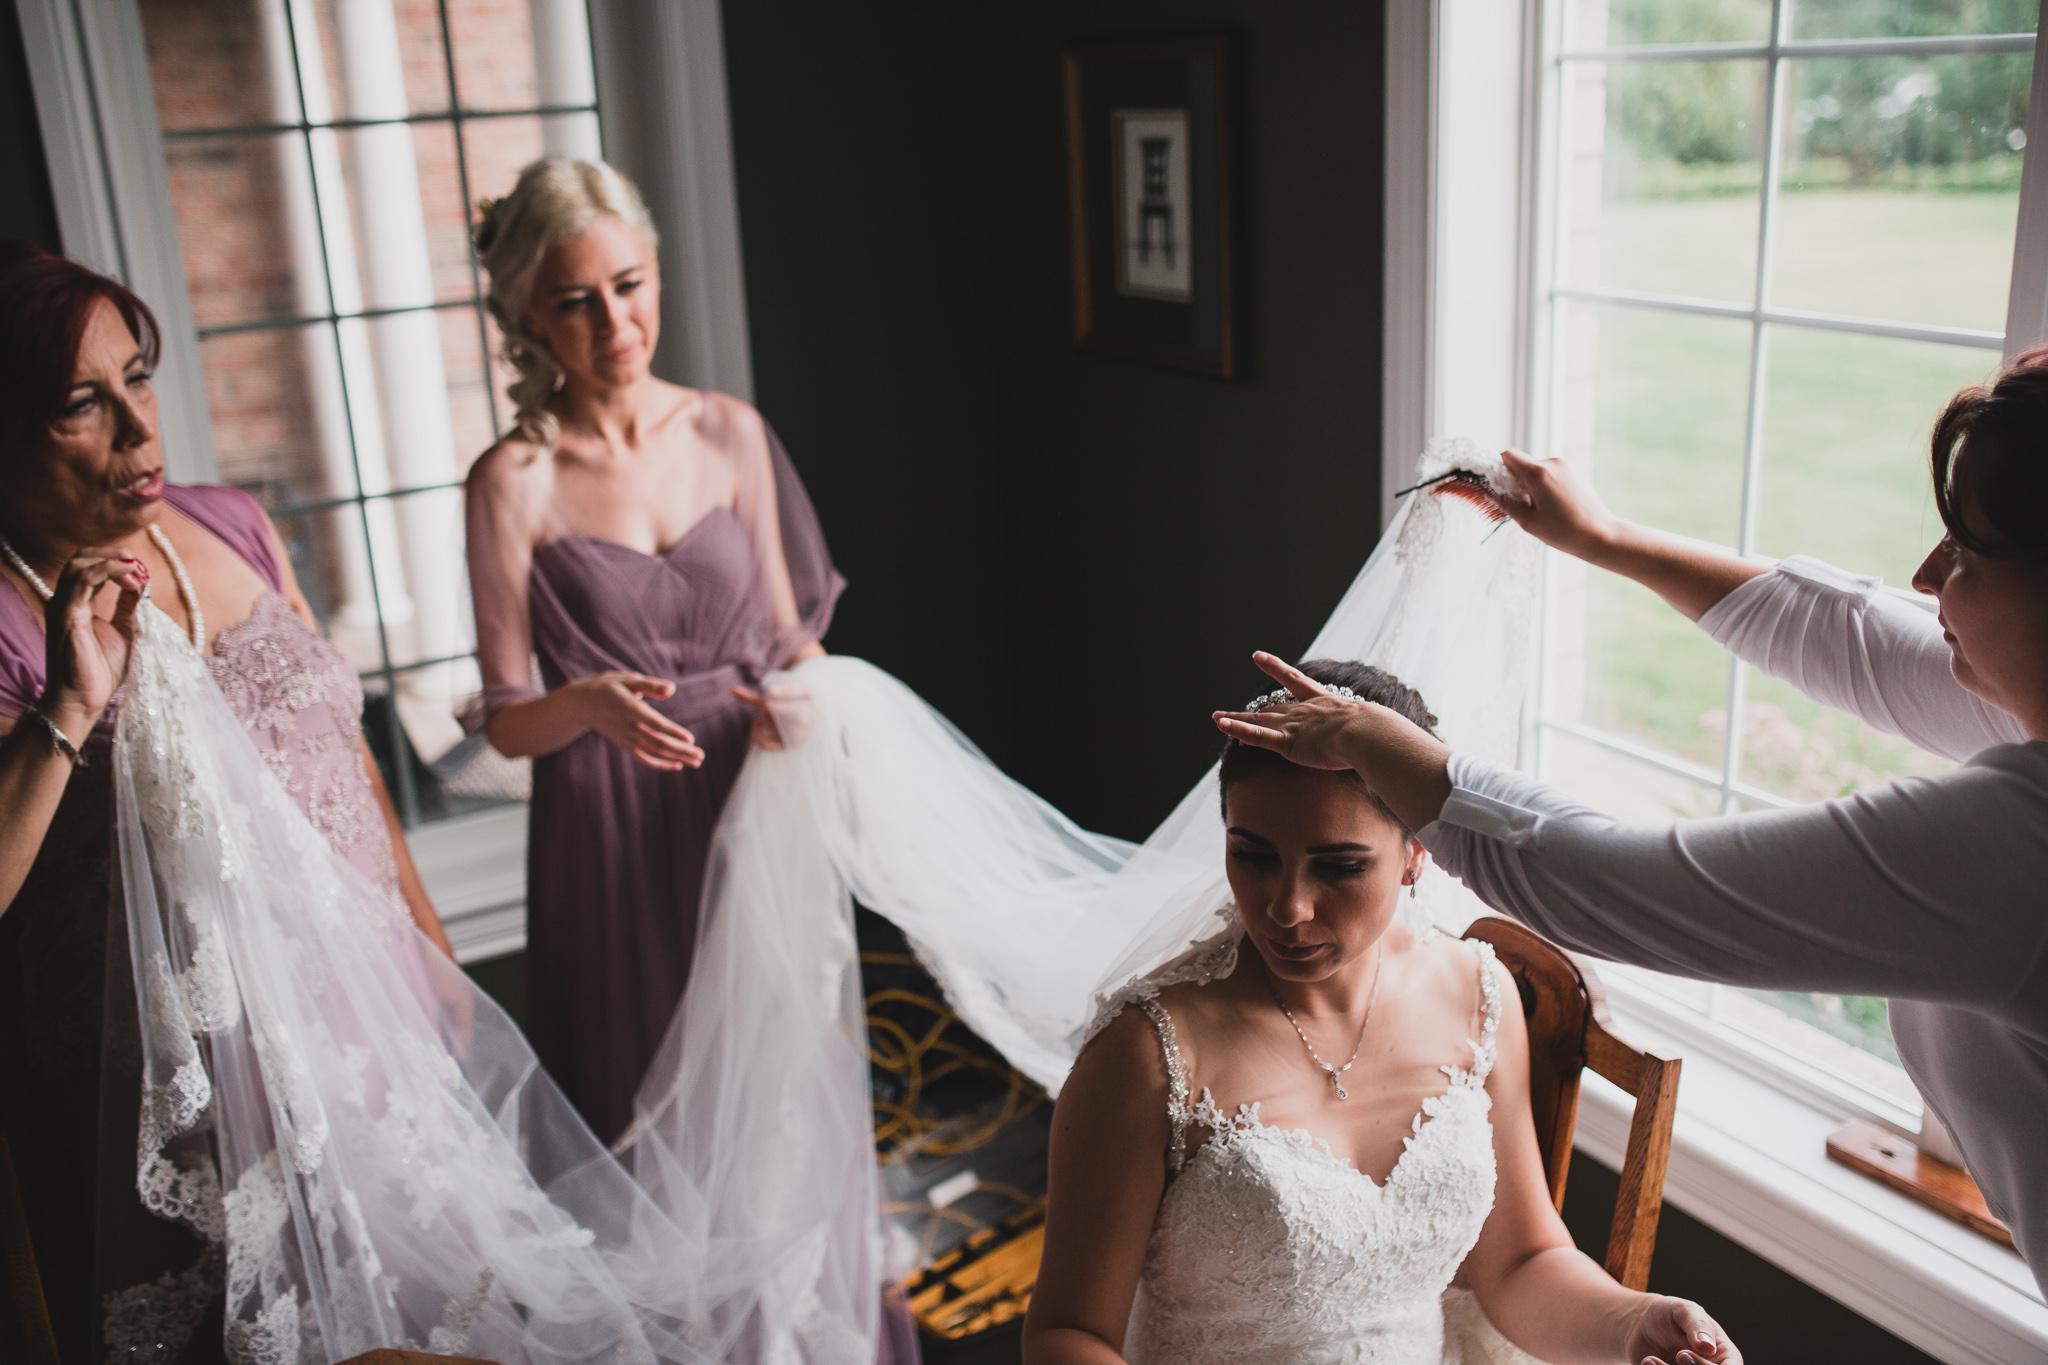 Natural, candid wedding photography Ottawa Ontario